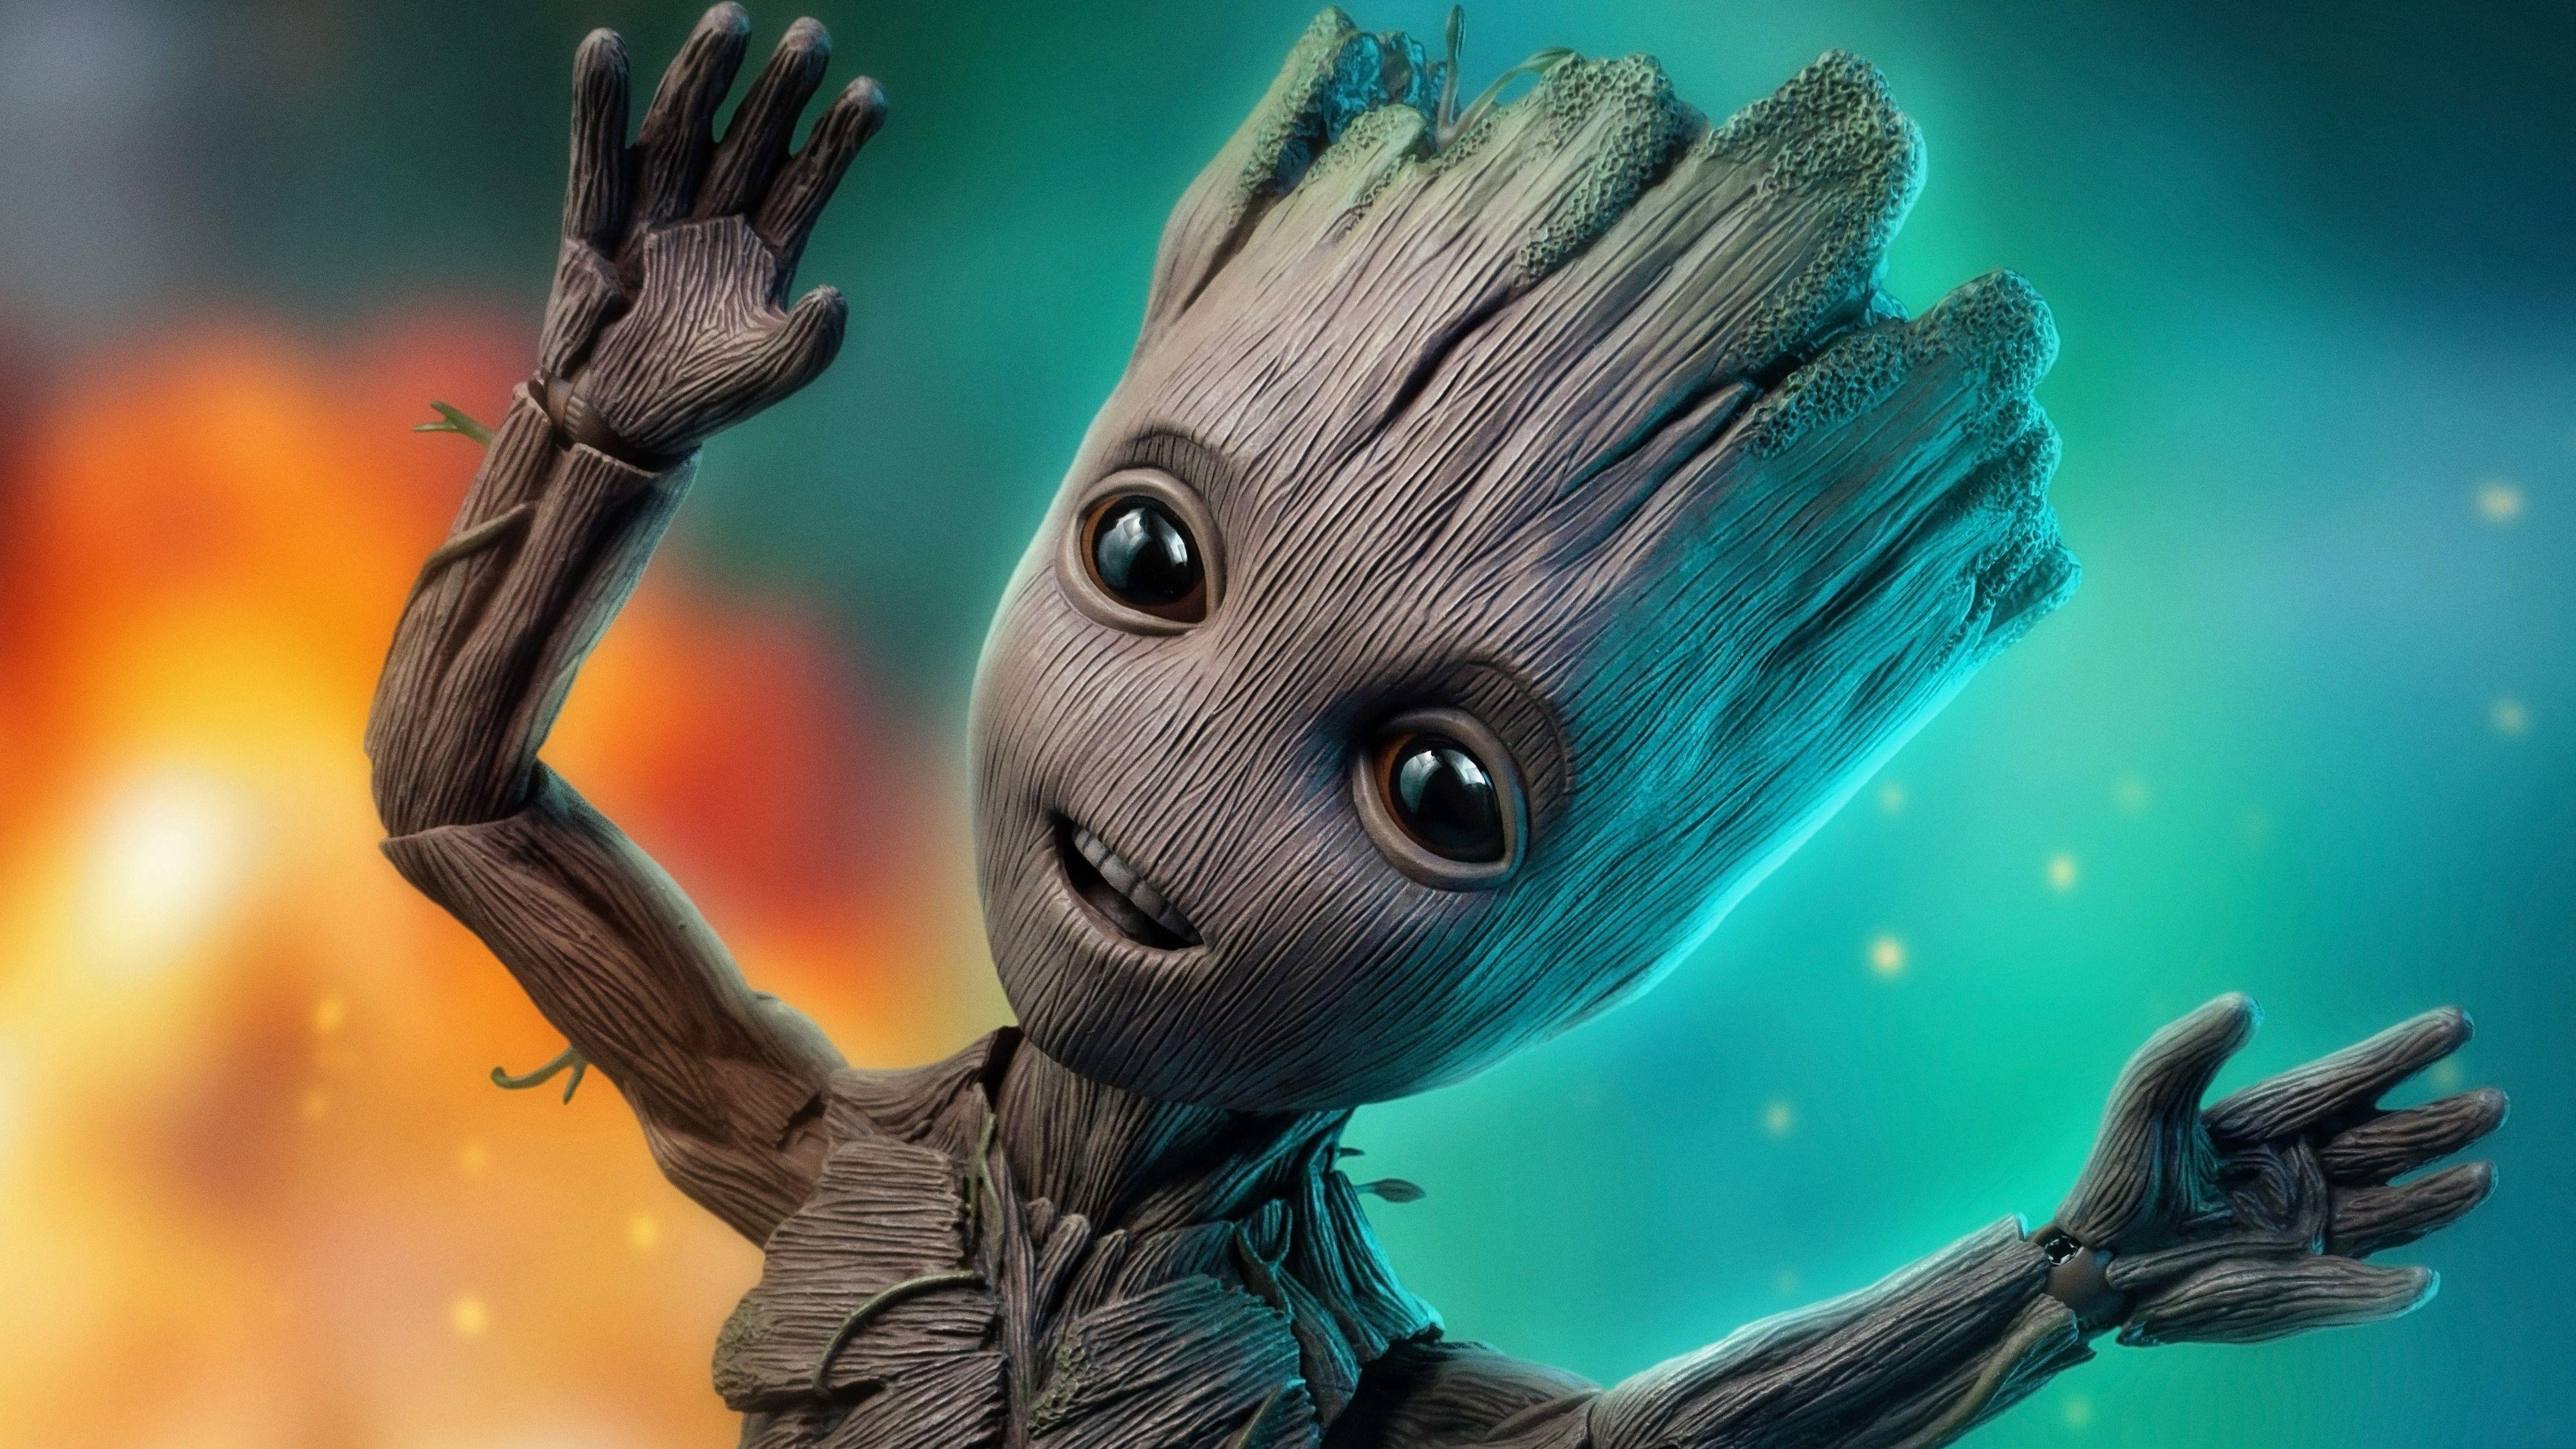 Baby Groot Wallpaper Hd Android 3d Wallpapers Marvel Aslan Kral Galeri